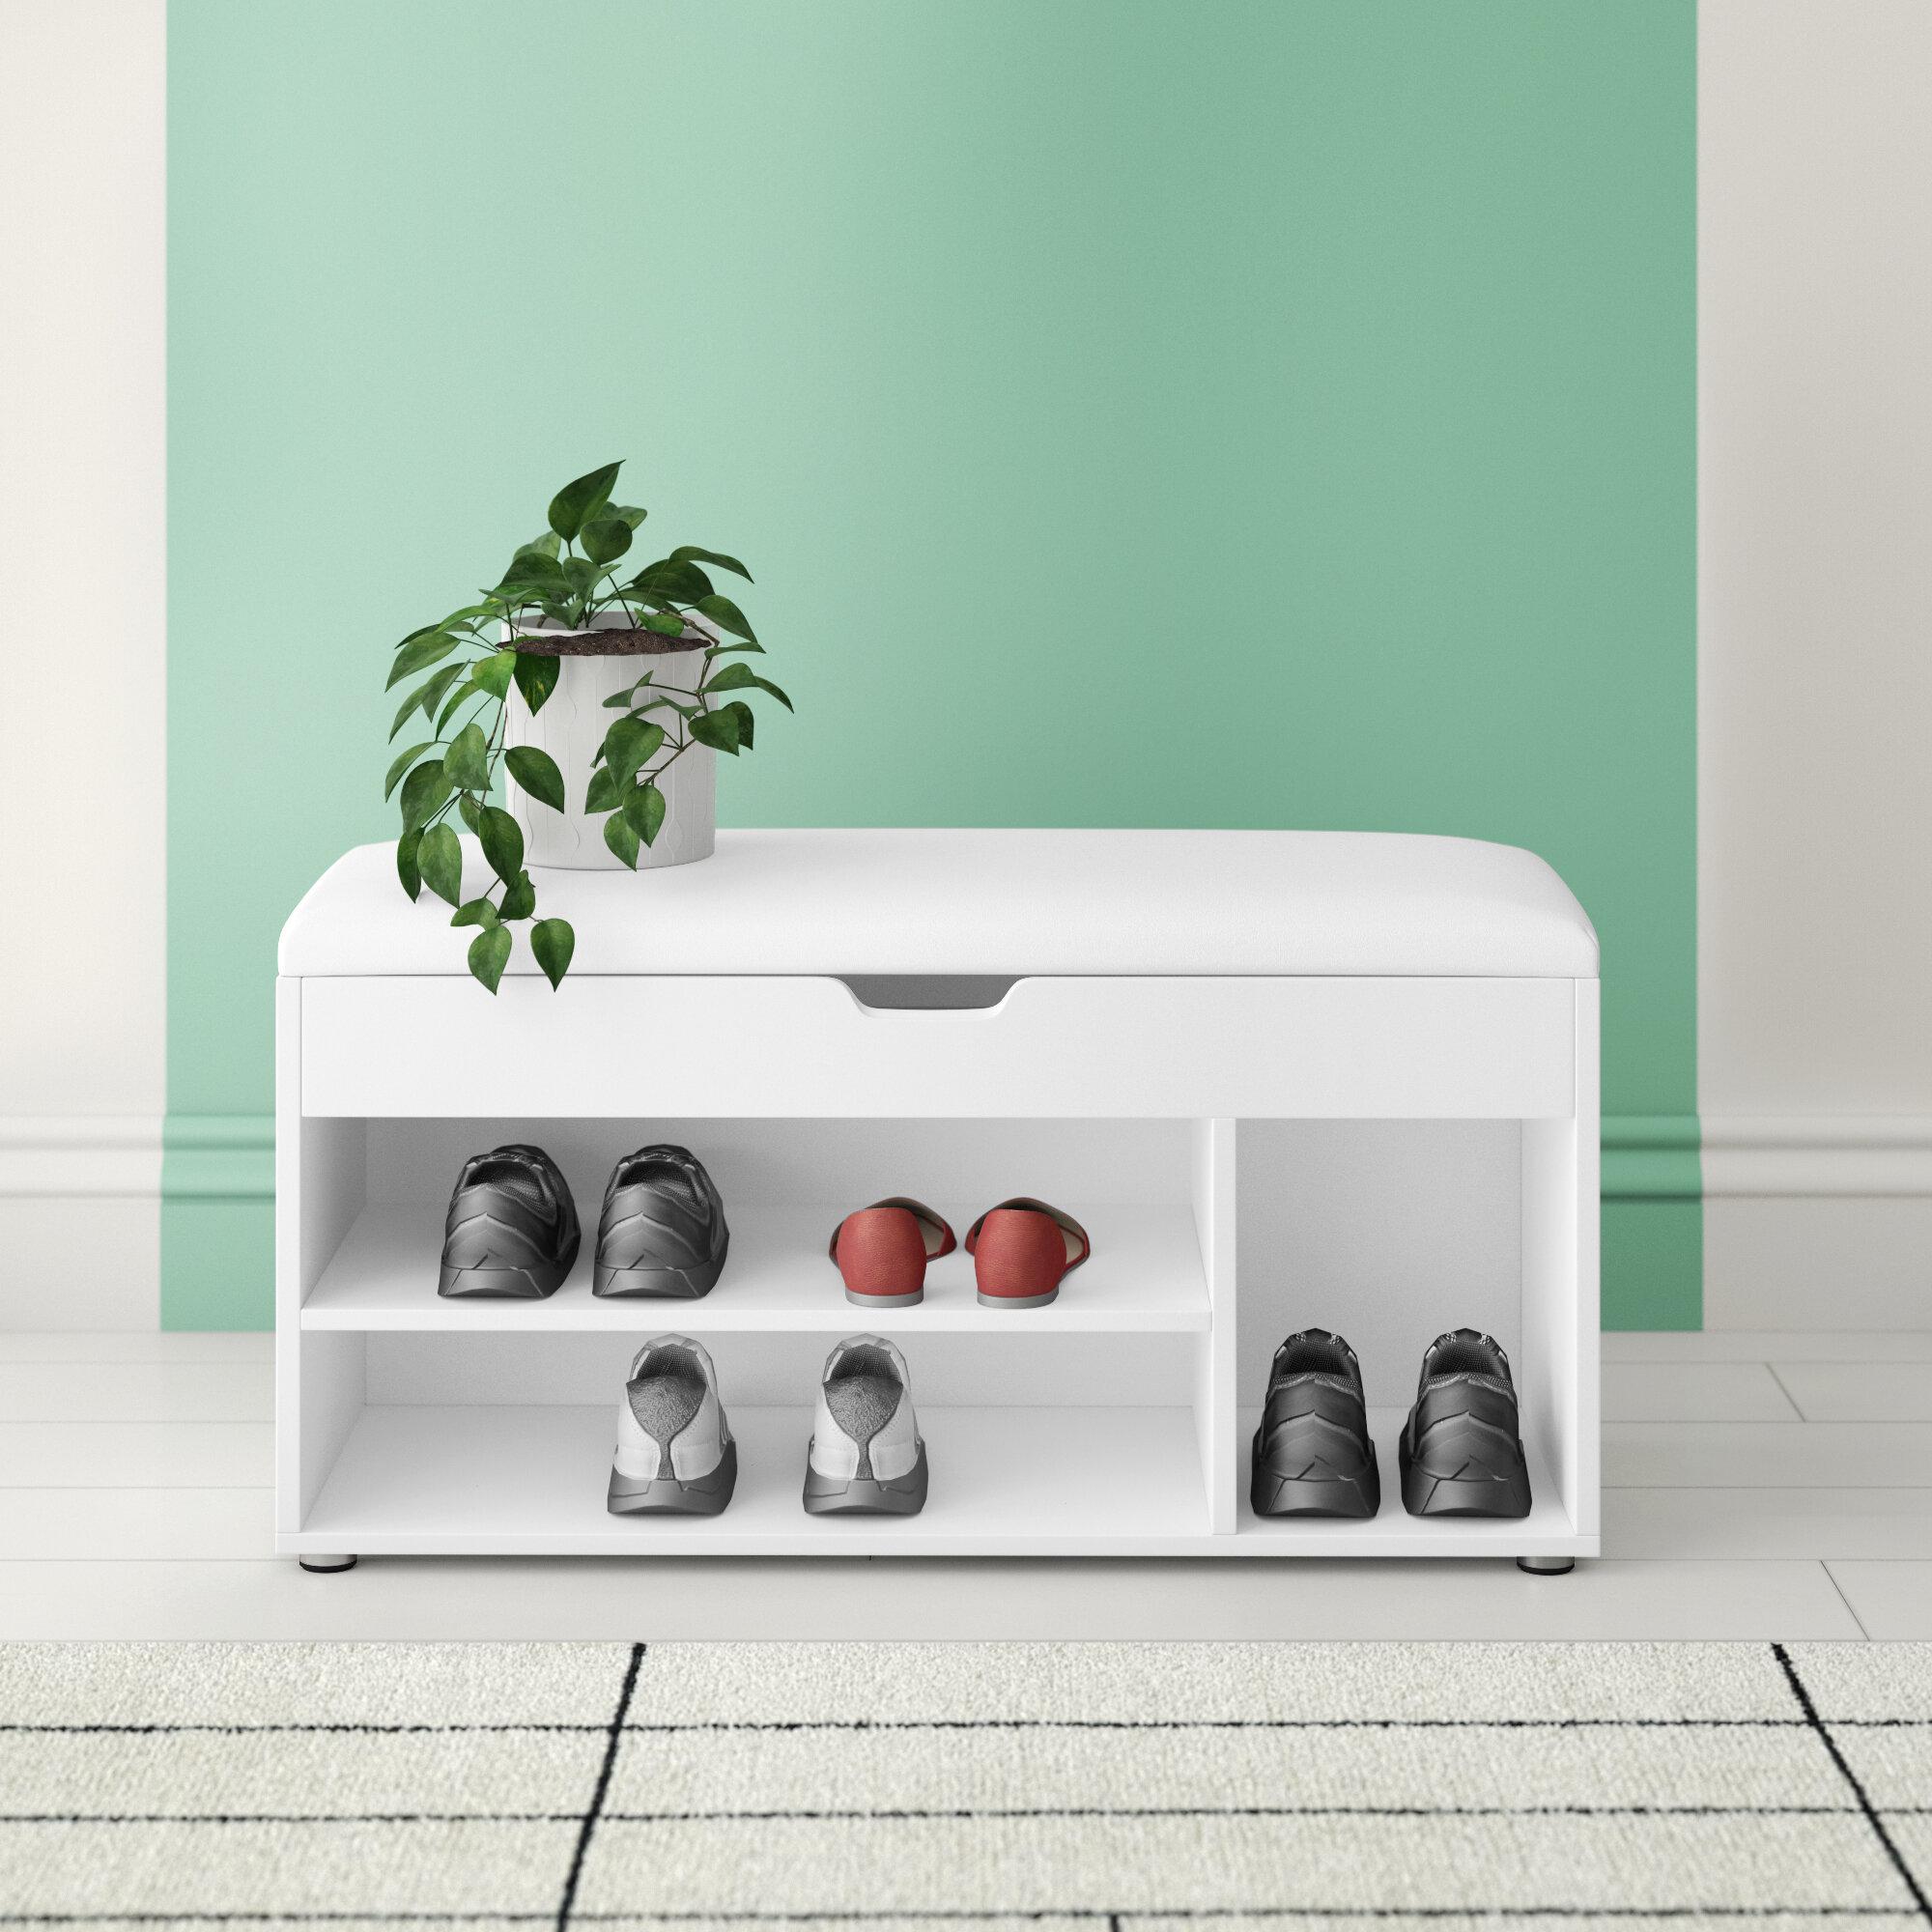 Hashtag Home Entryway 8 Pair Shoe Storage Bench Reviews Wayfair Co Uk